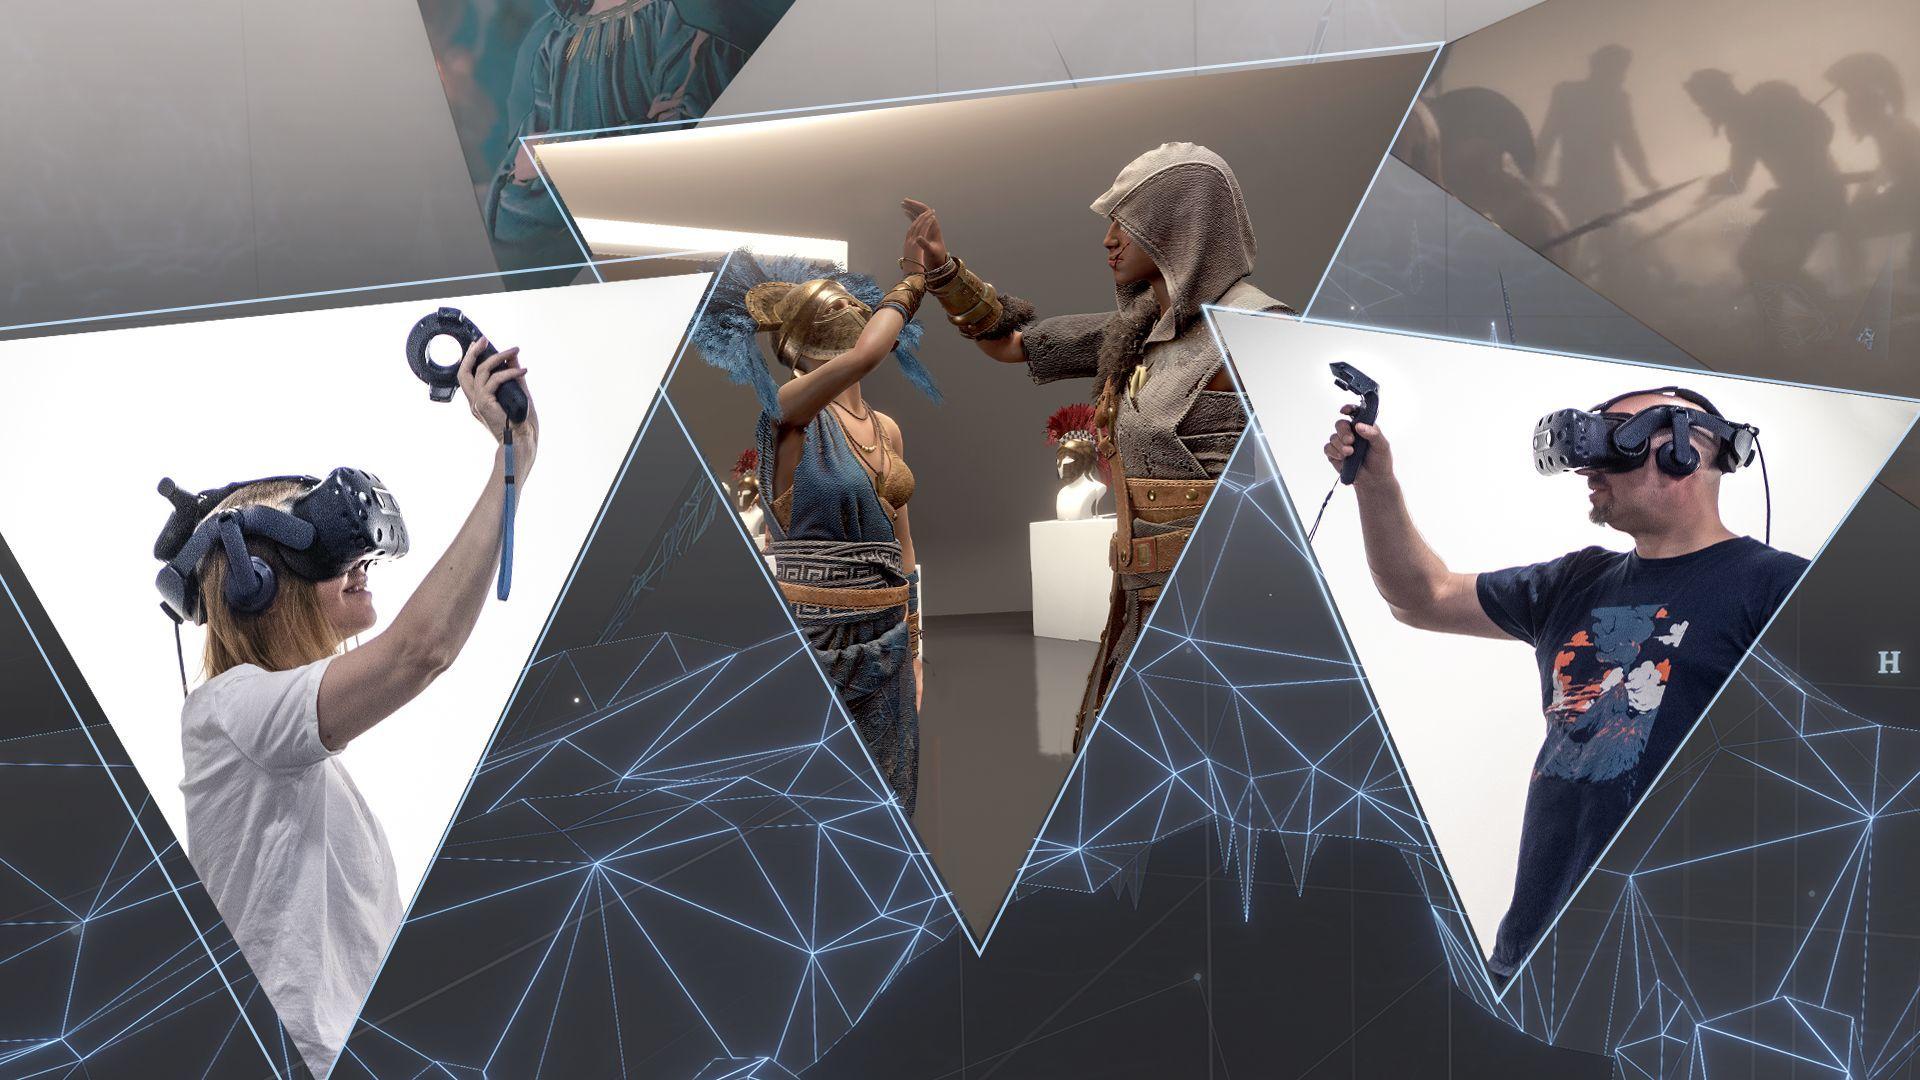 10% ofF VR adventures